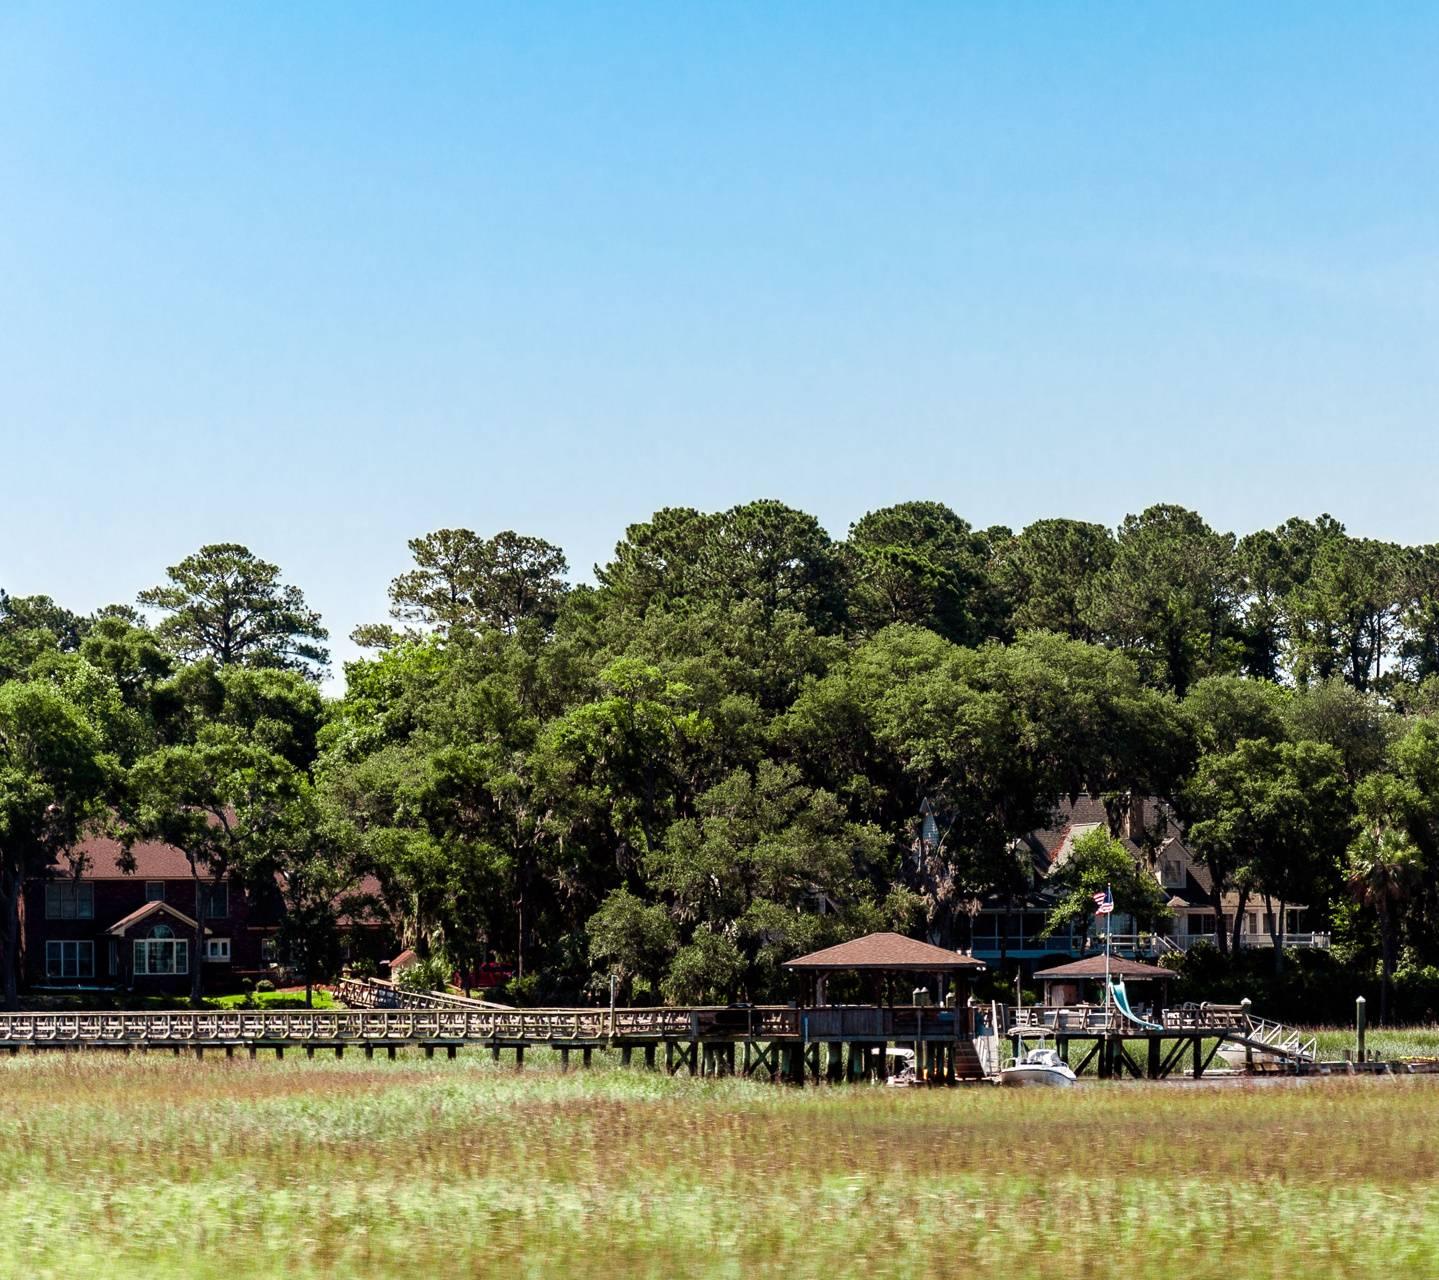 Houses on a Swamp